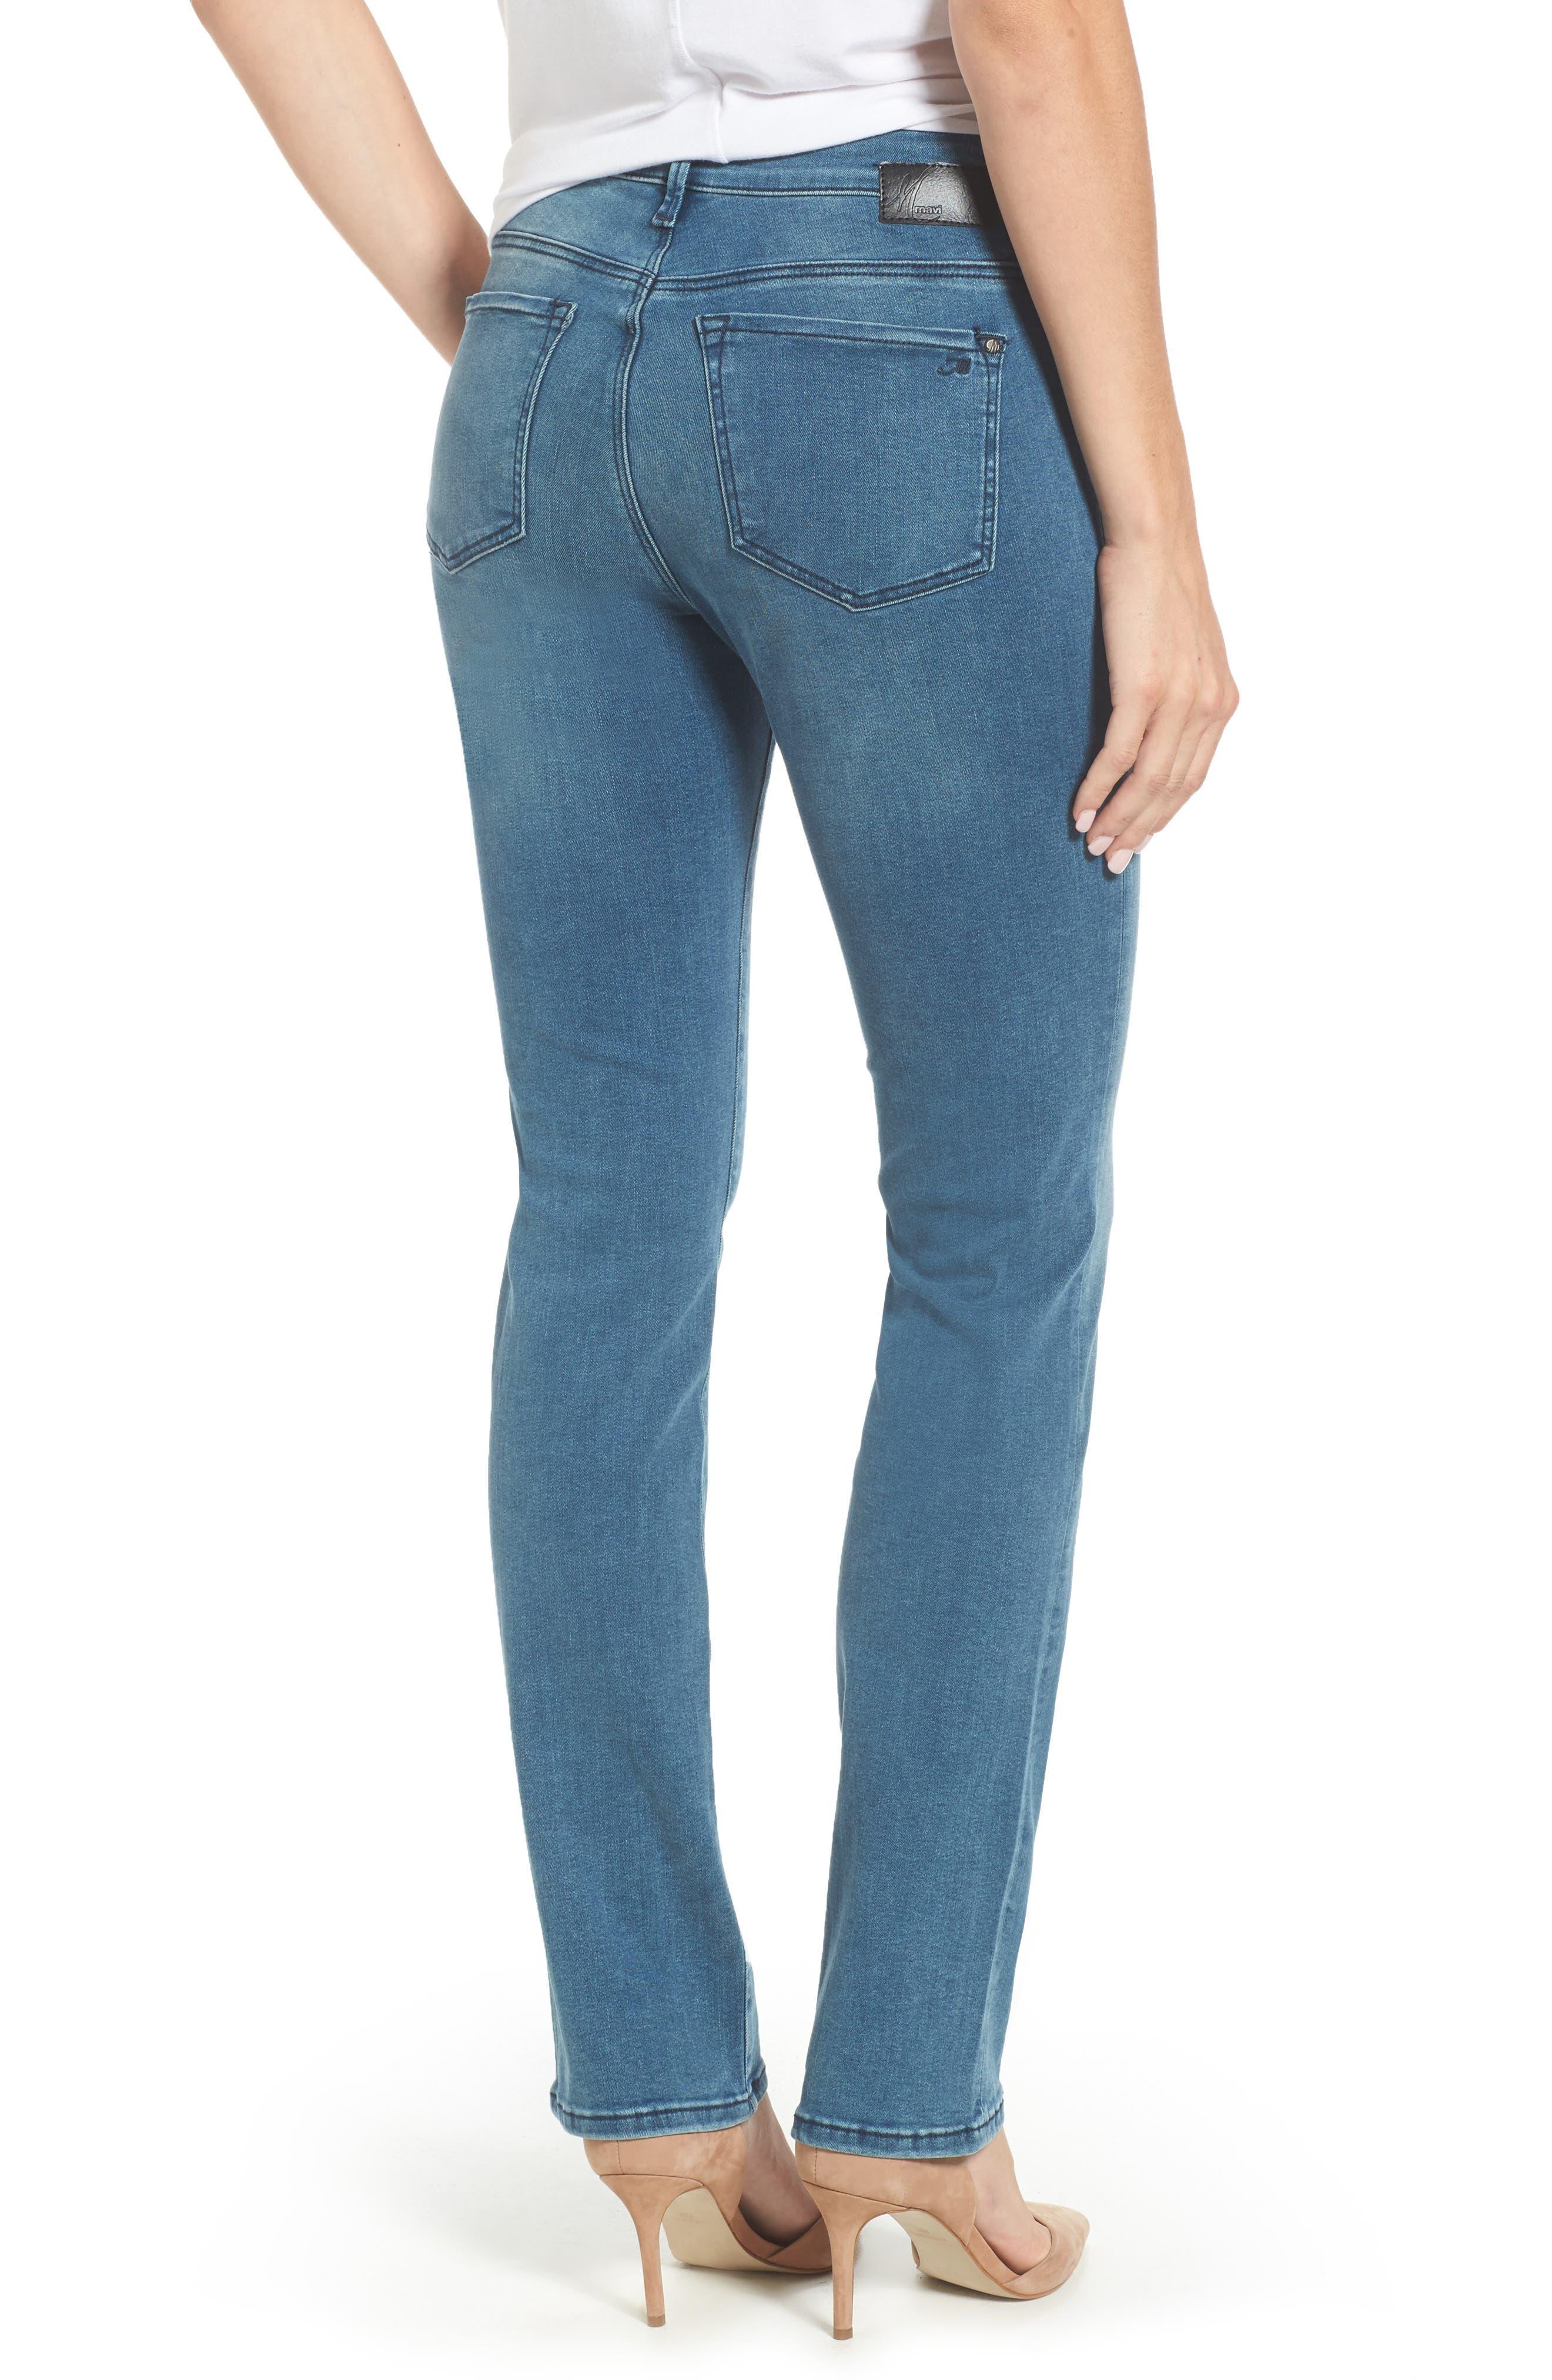 Kendra High Waist Straight Leg Jeans,                             Alternate thumbnail 2, color,                             420